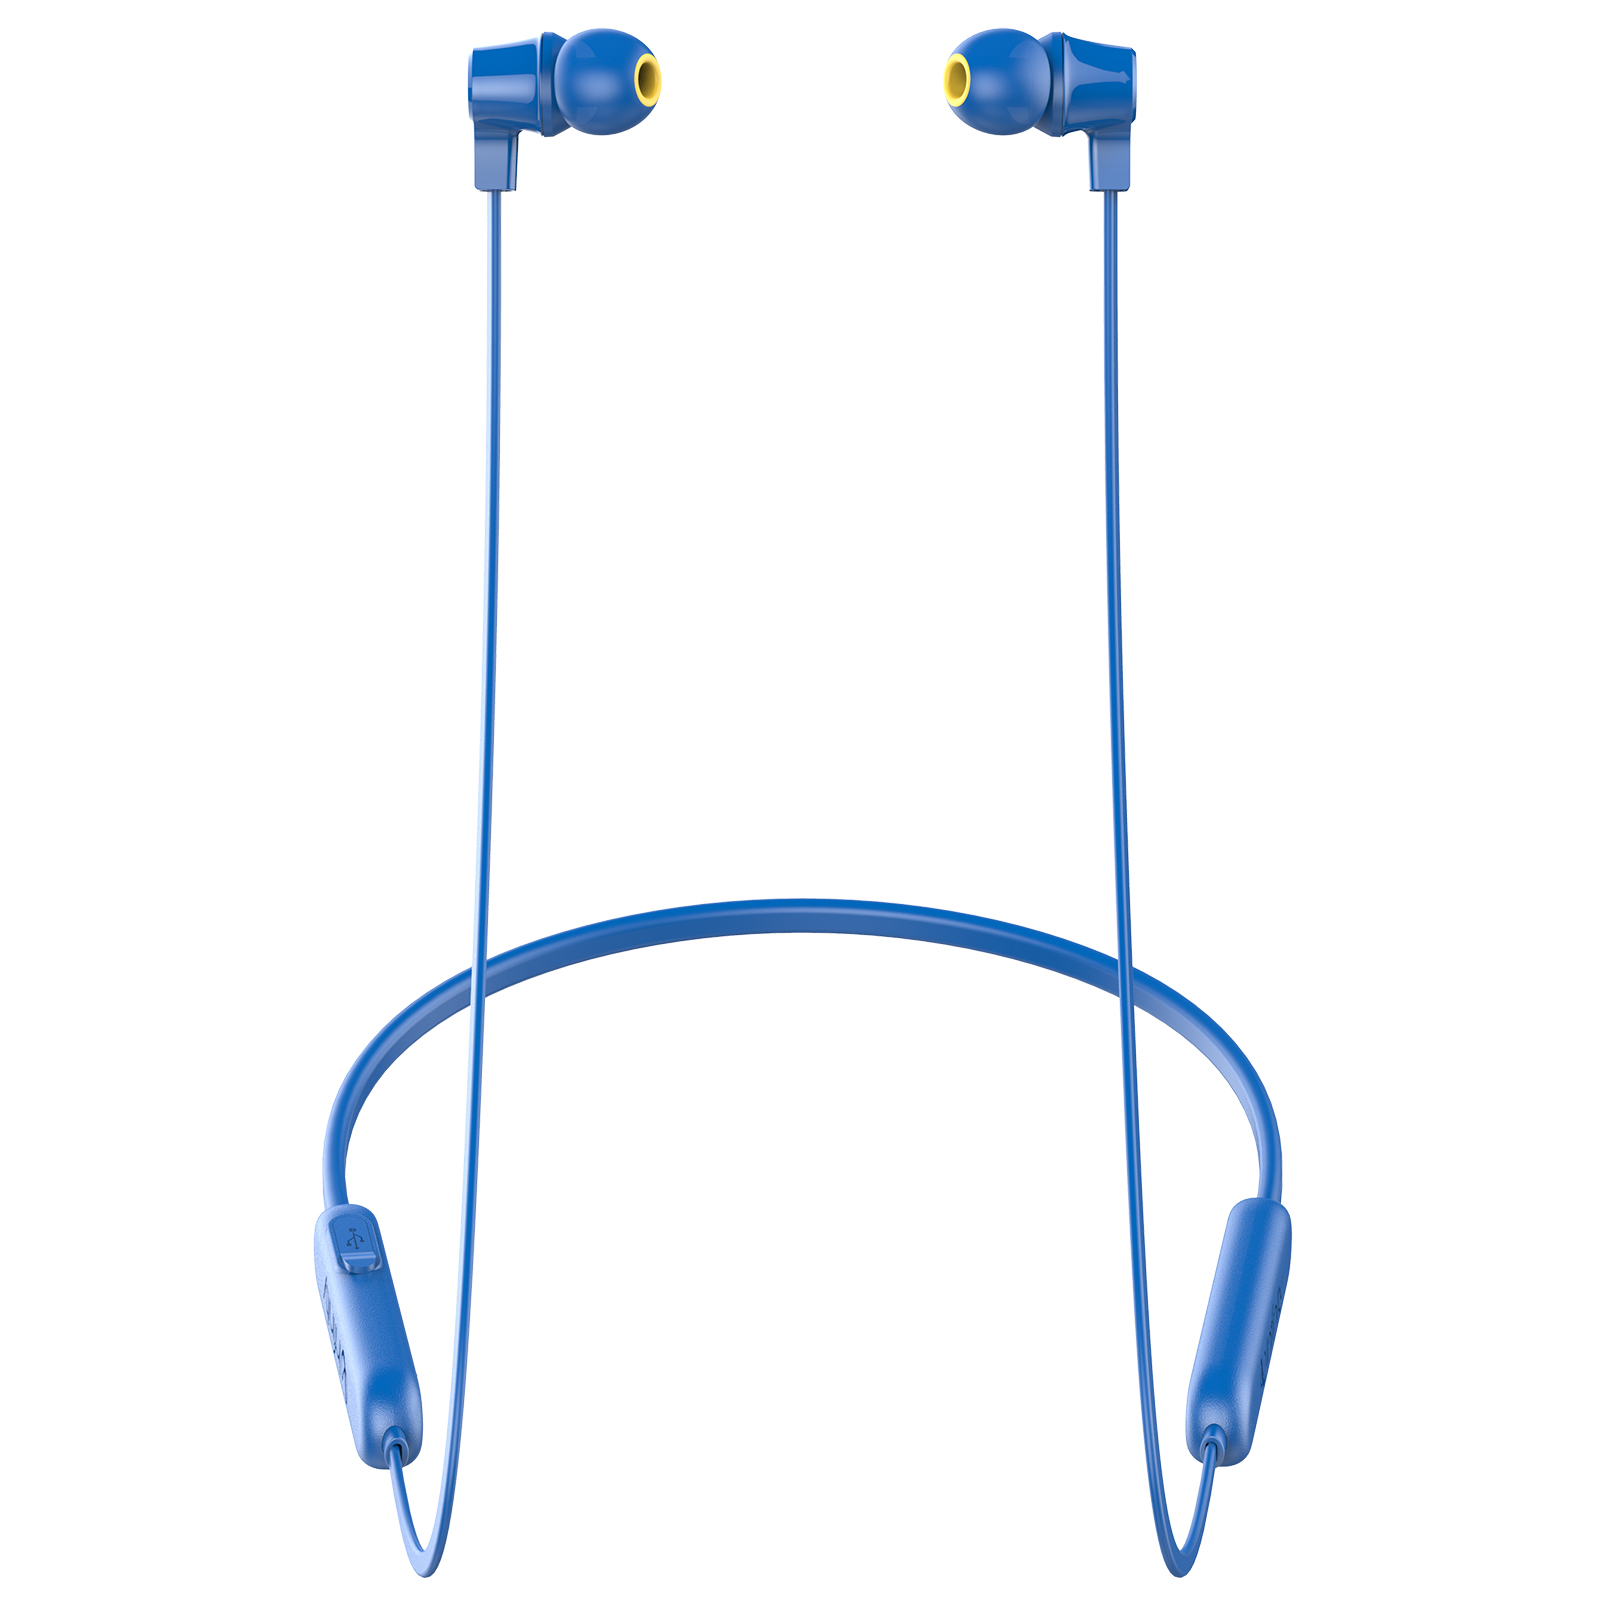 INFINITY GLIDE N100 - Blue - In-Ear Ultra Light Neckband - Left